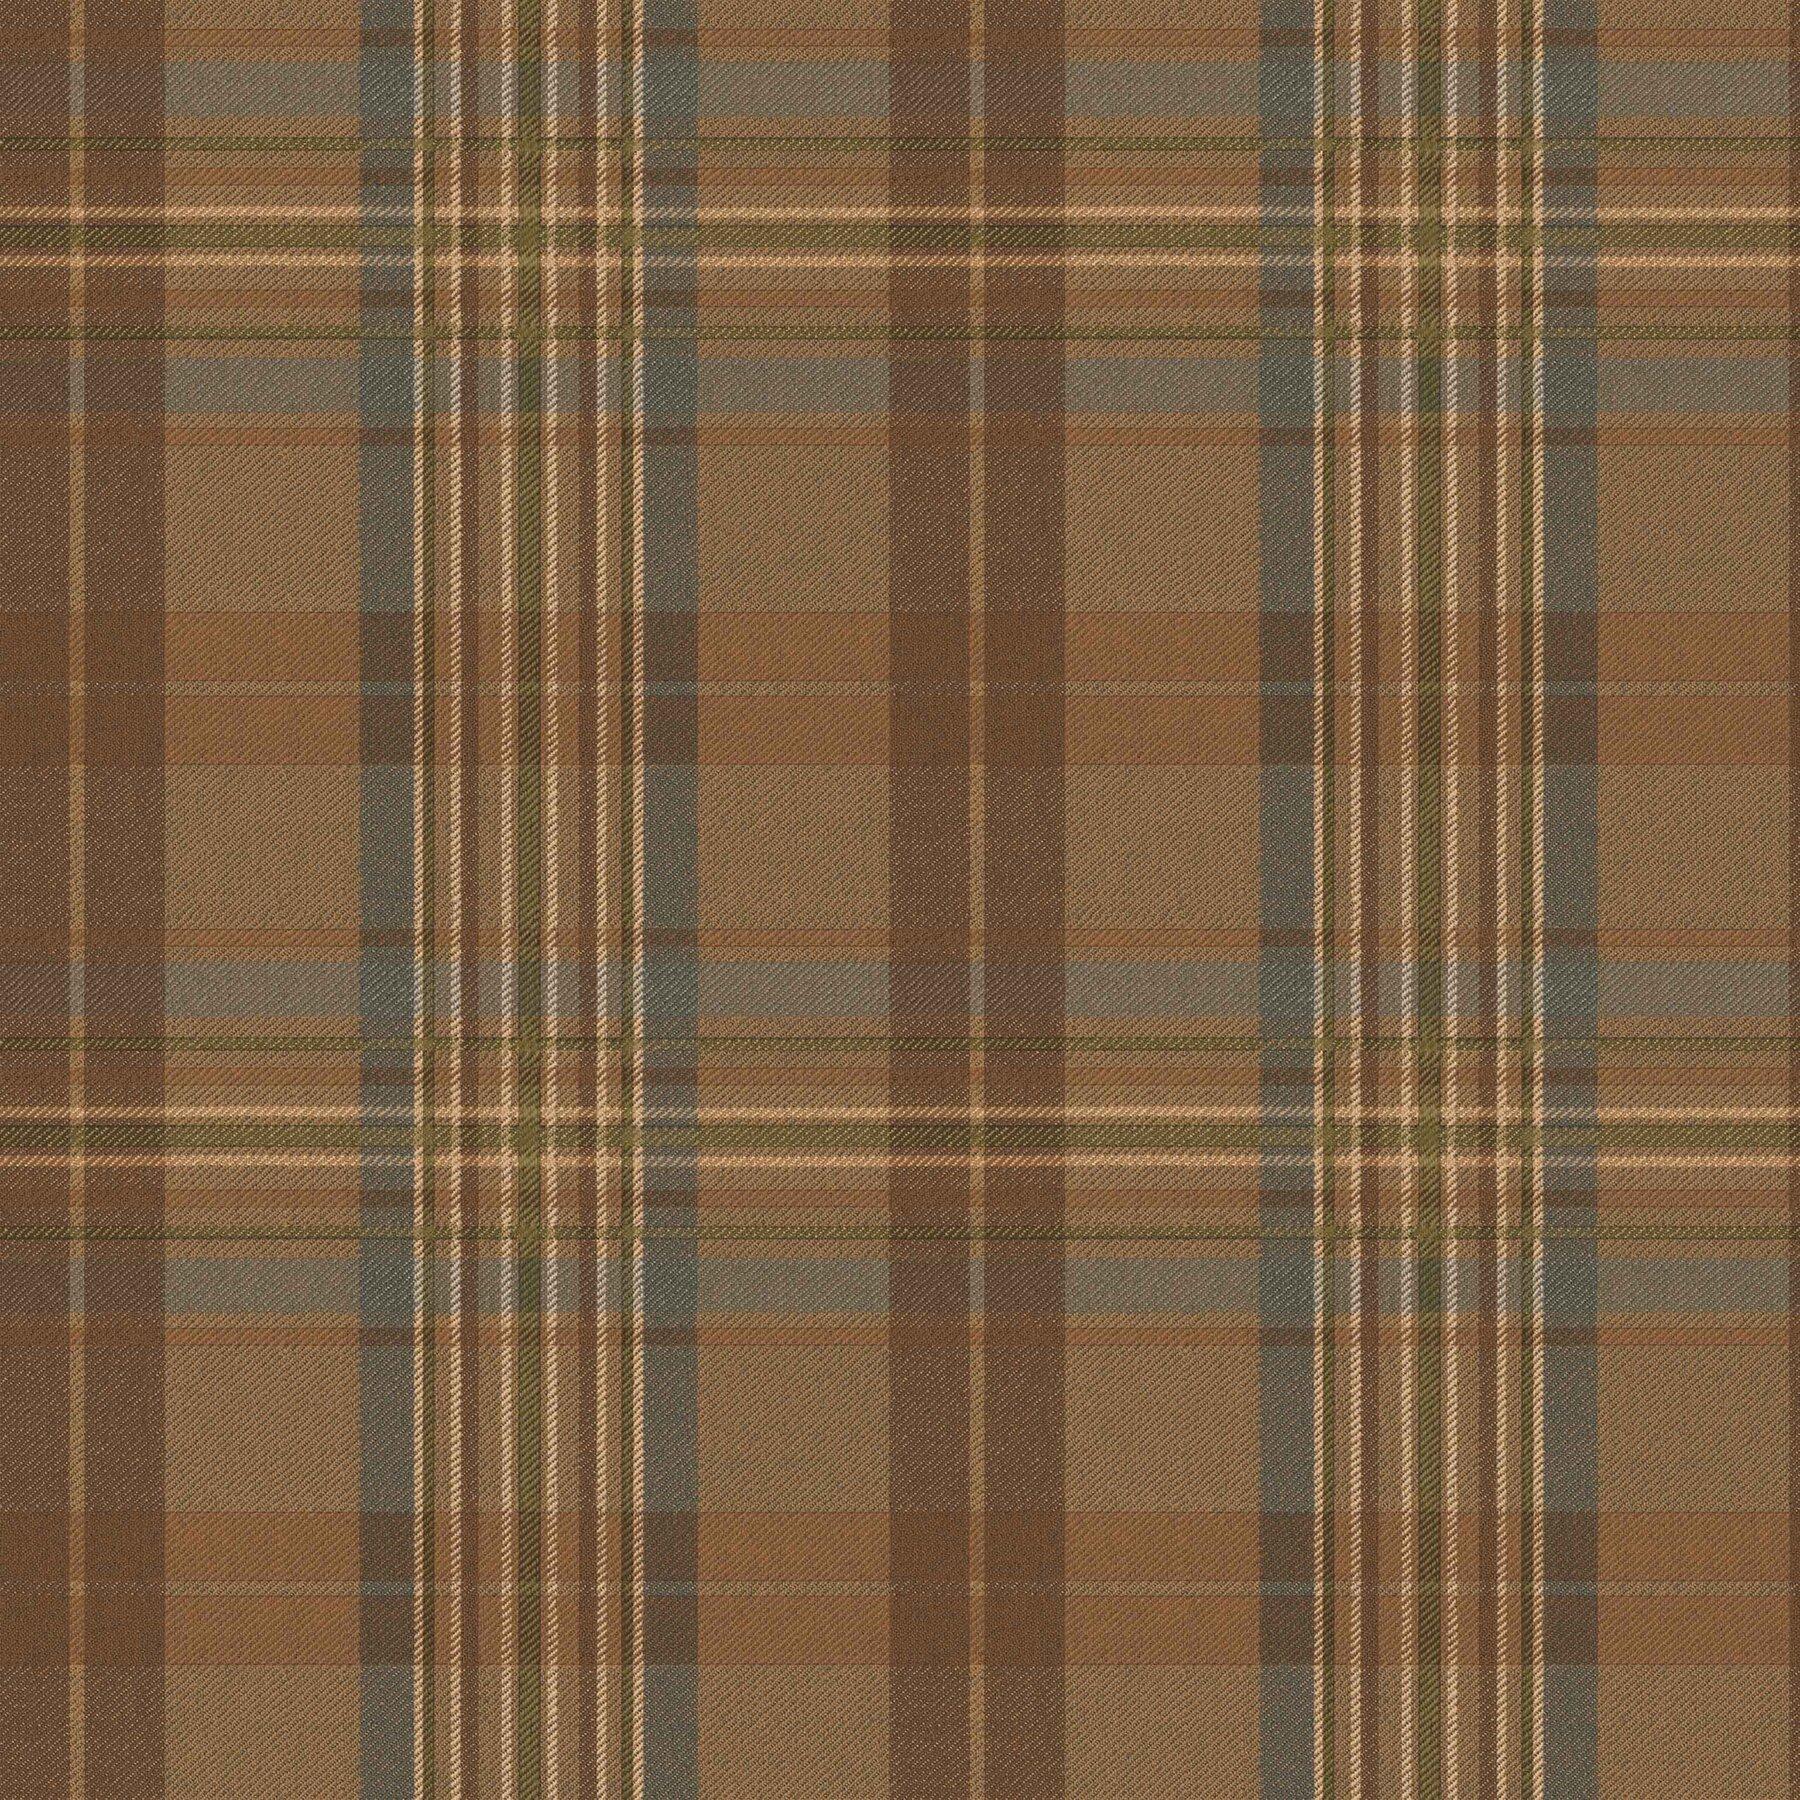 Brewster home fashions gentlemen 39 s quarters austin 33 39 x for Tartan wallpaper next